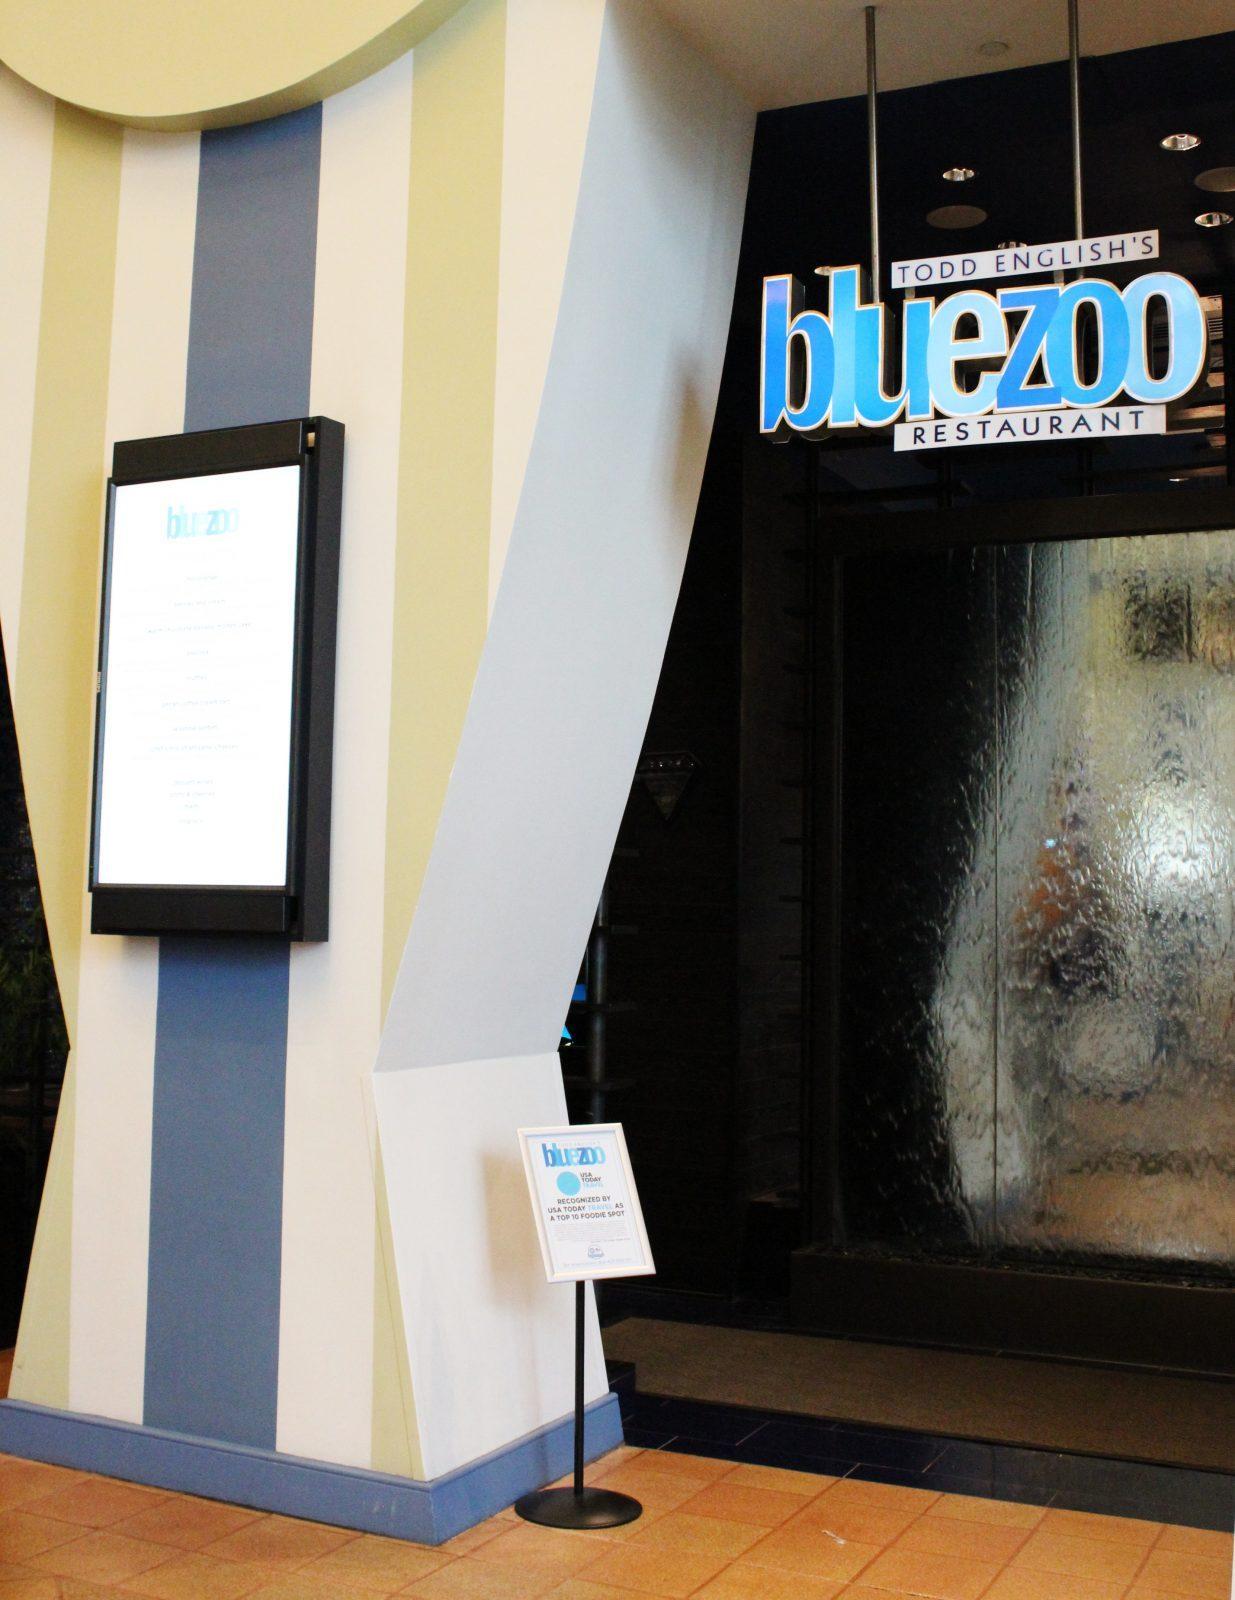 Blue Zoo Restaurant entrance